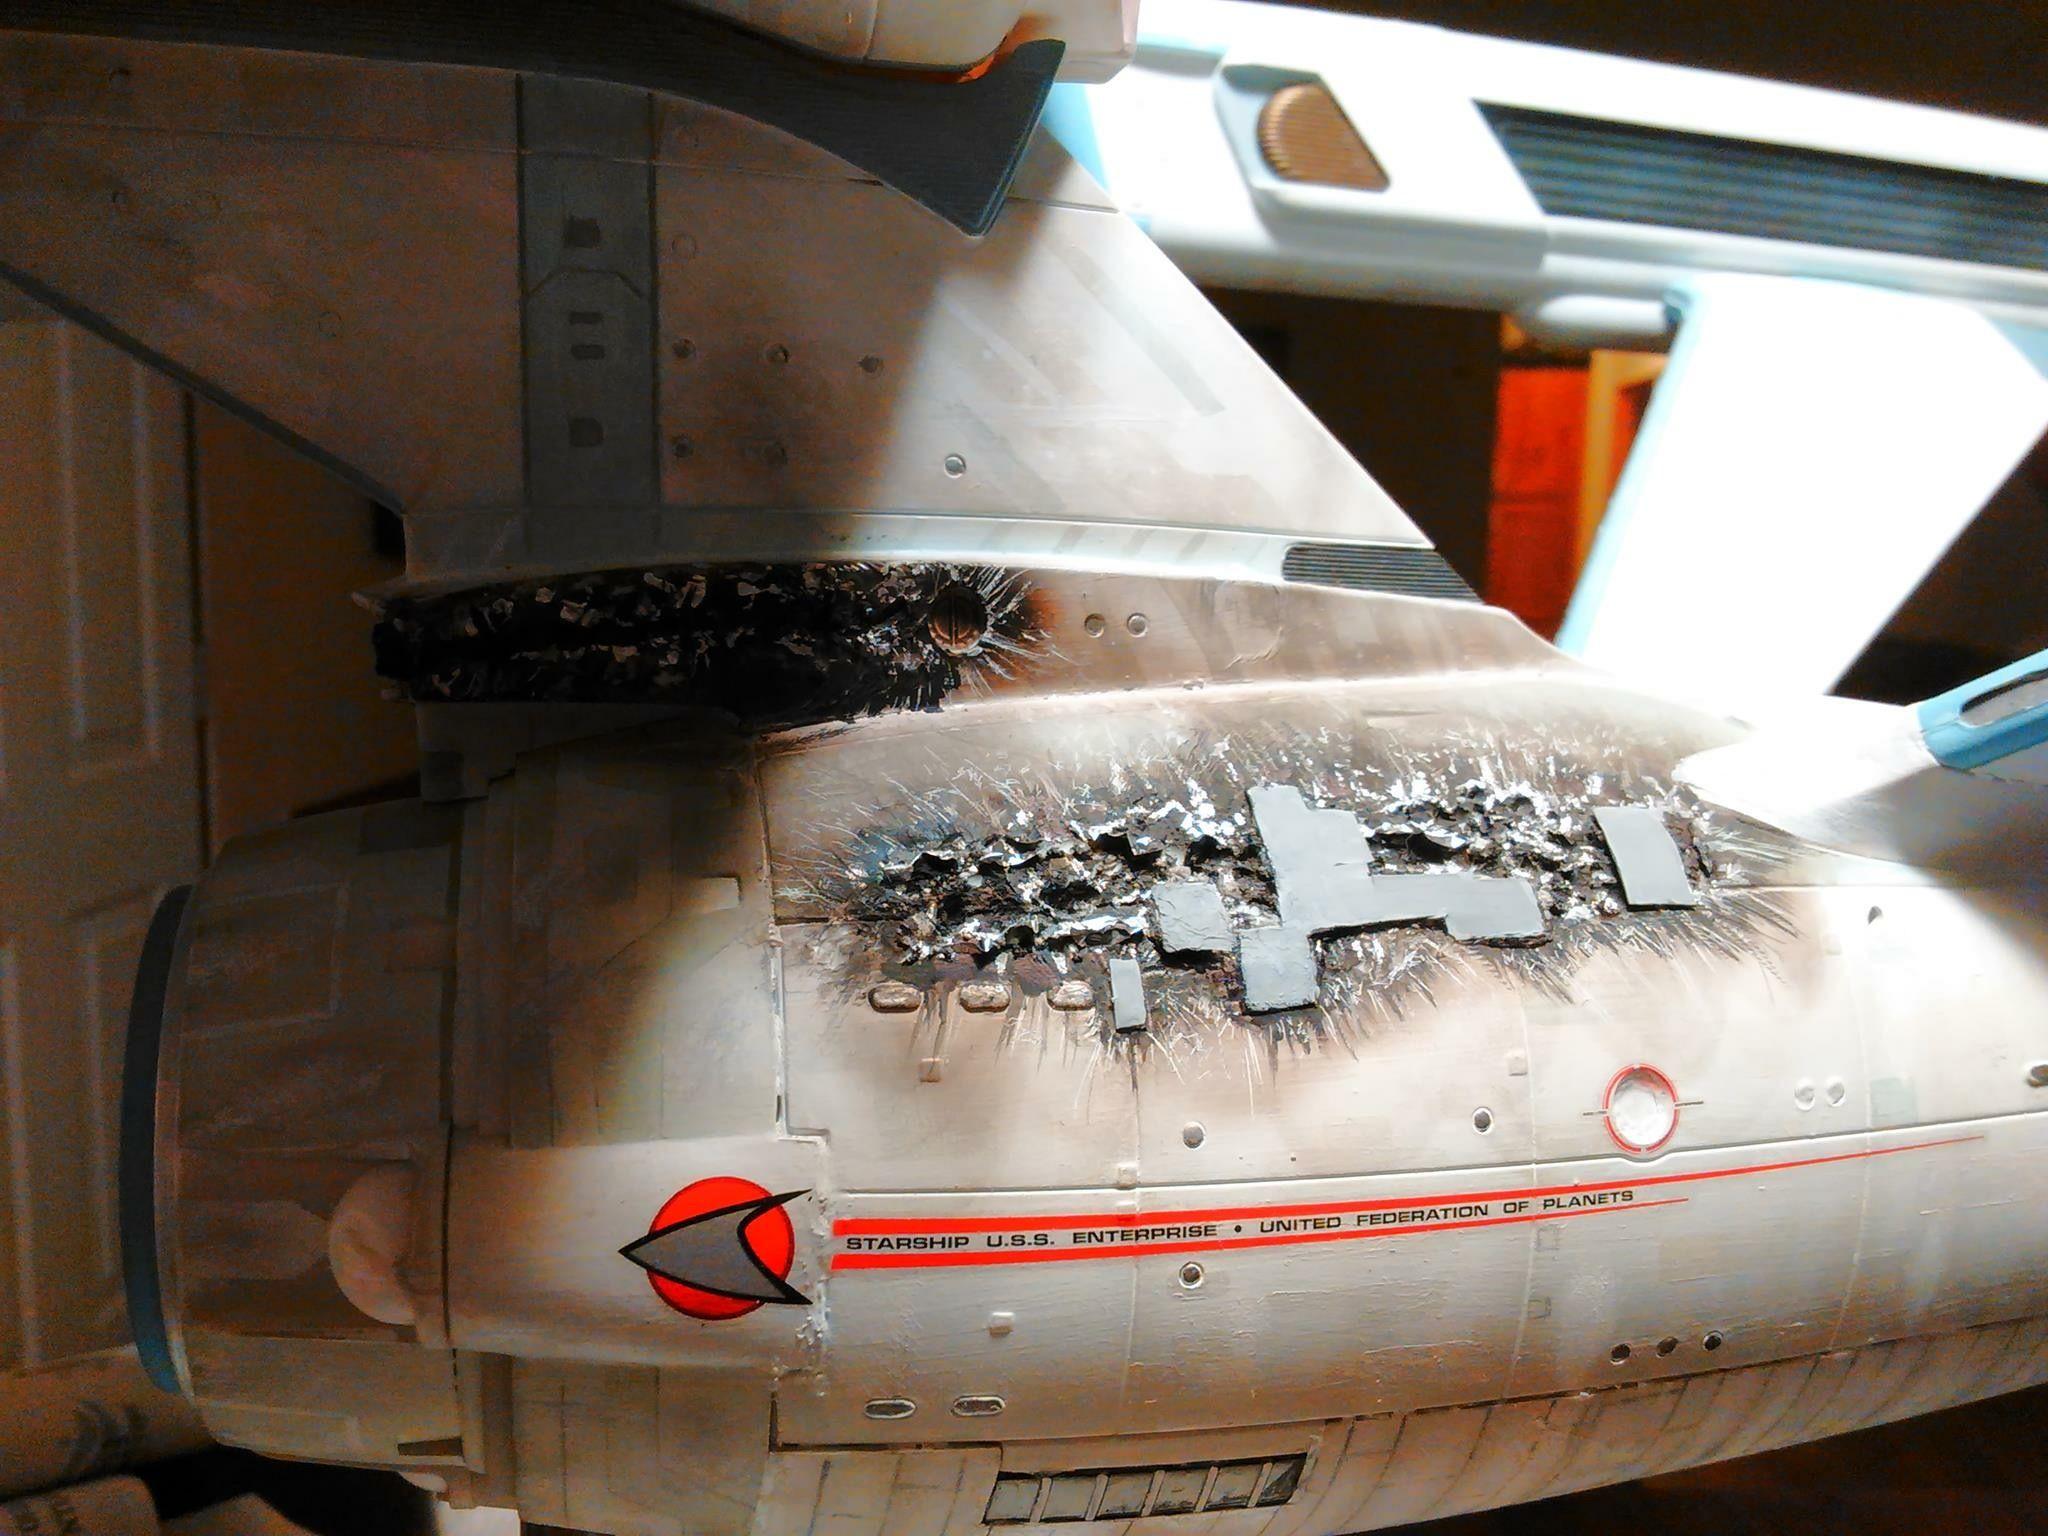 Star trek uss enterprise ncc refit 1 scale model - Star Trek 1 350 Scale Polar Lights Uss Enterprise Refit Model Battle Damage